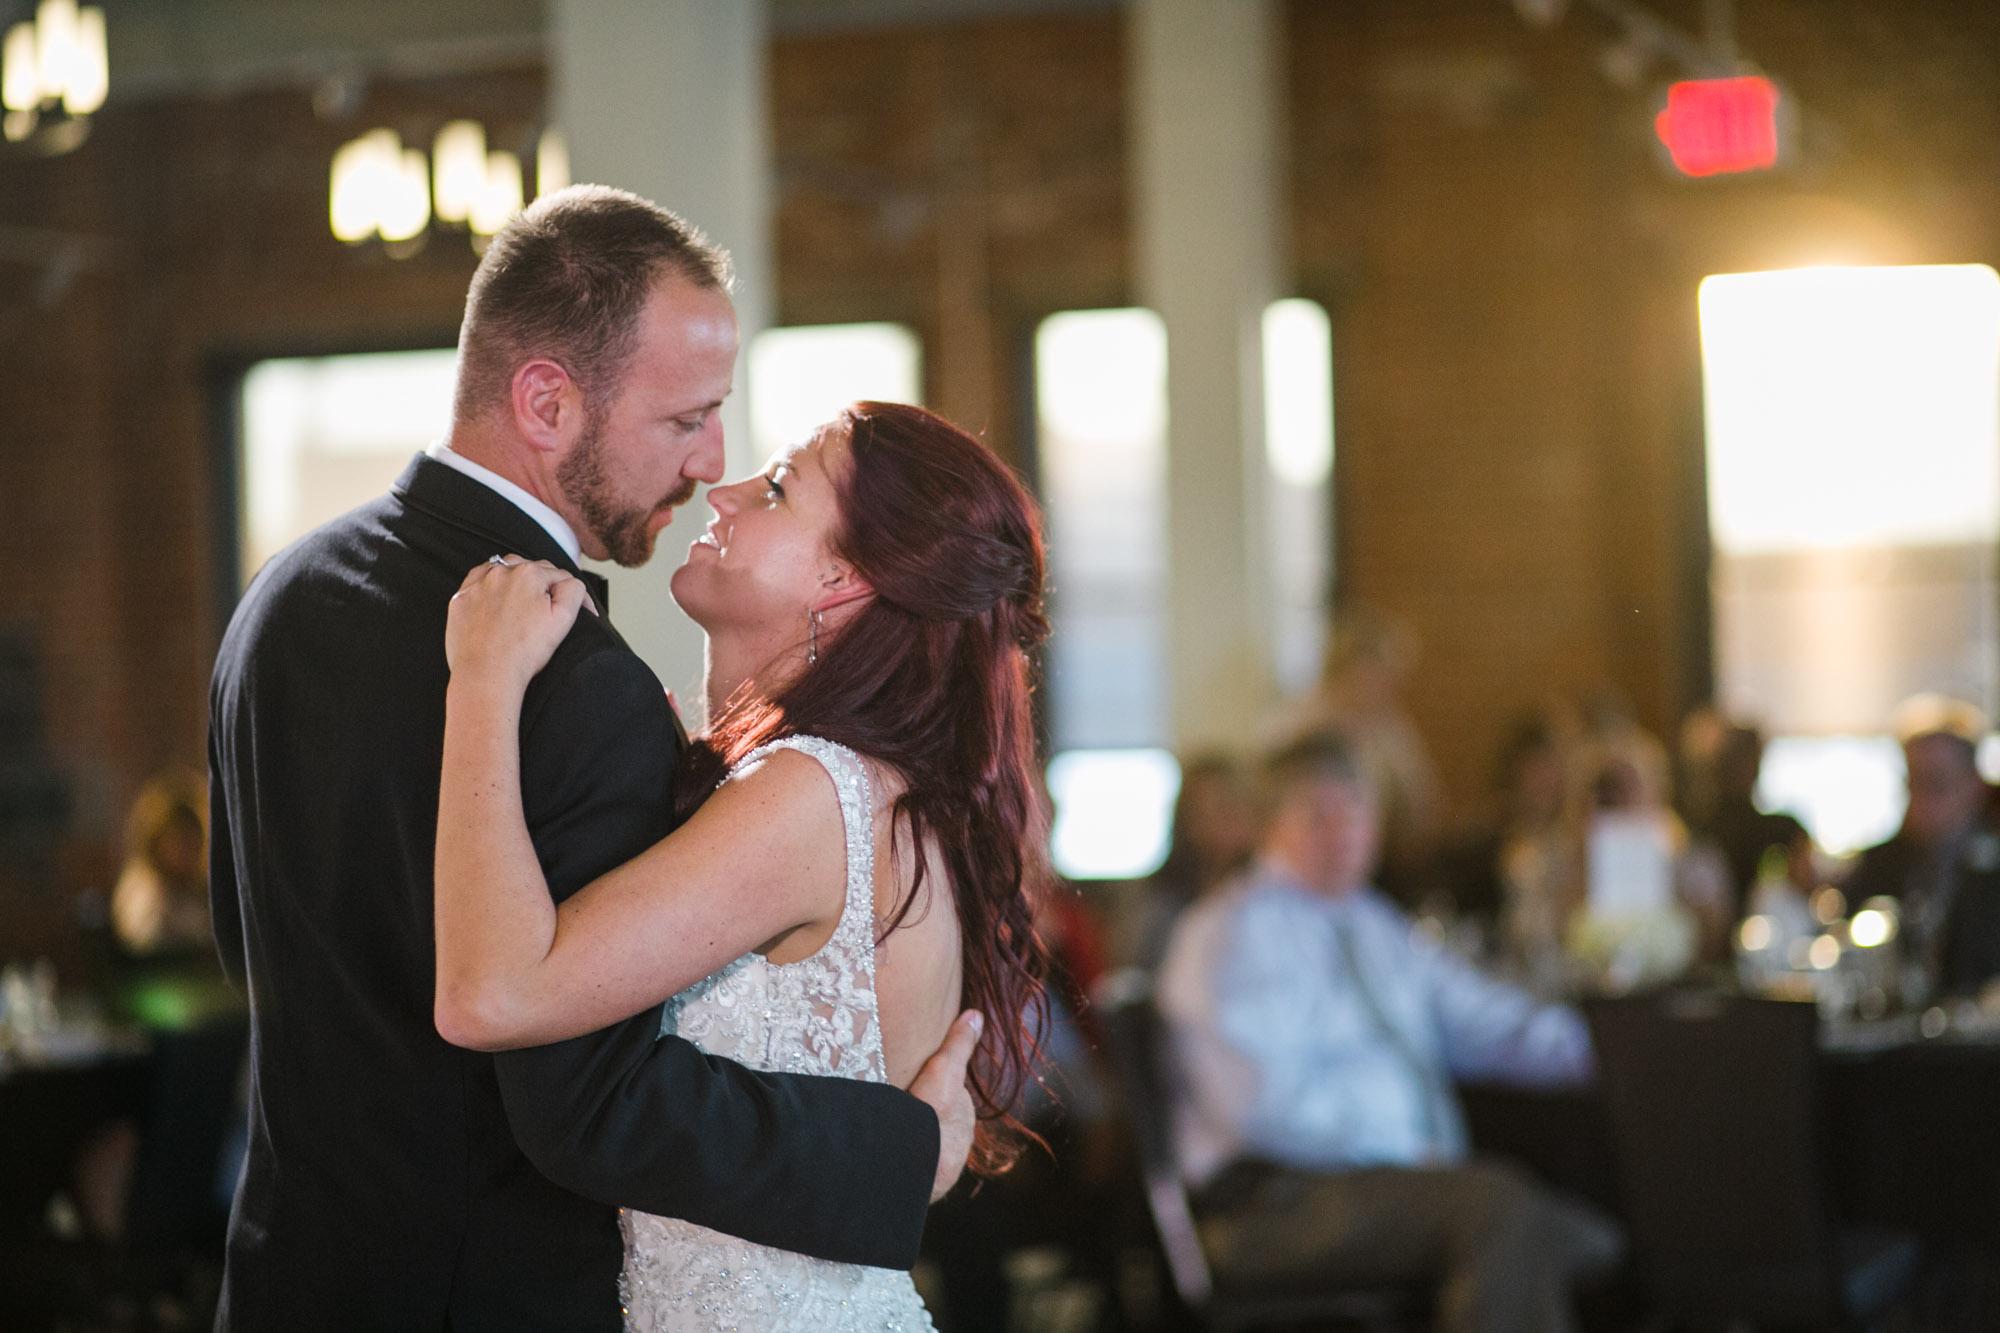 hensville-wedding-downtown-toledo-ohio (1 of 5).jpg